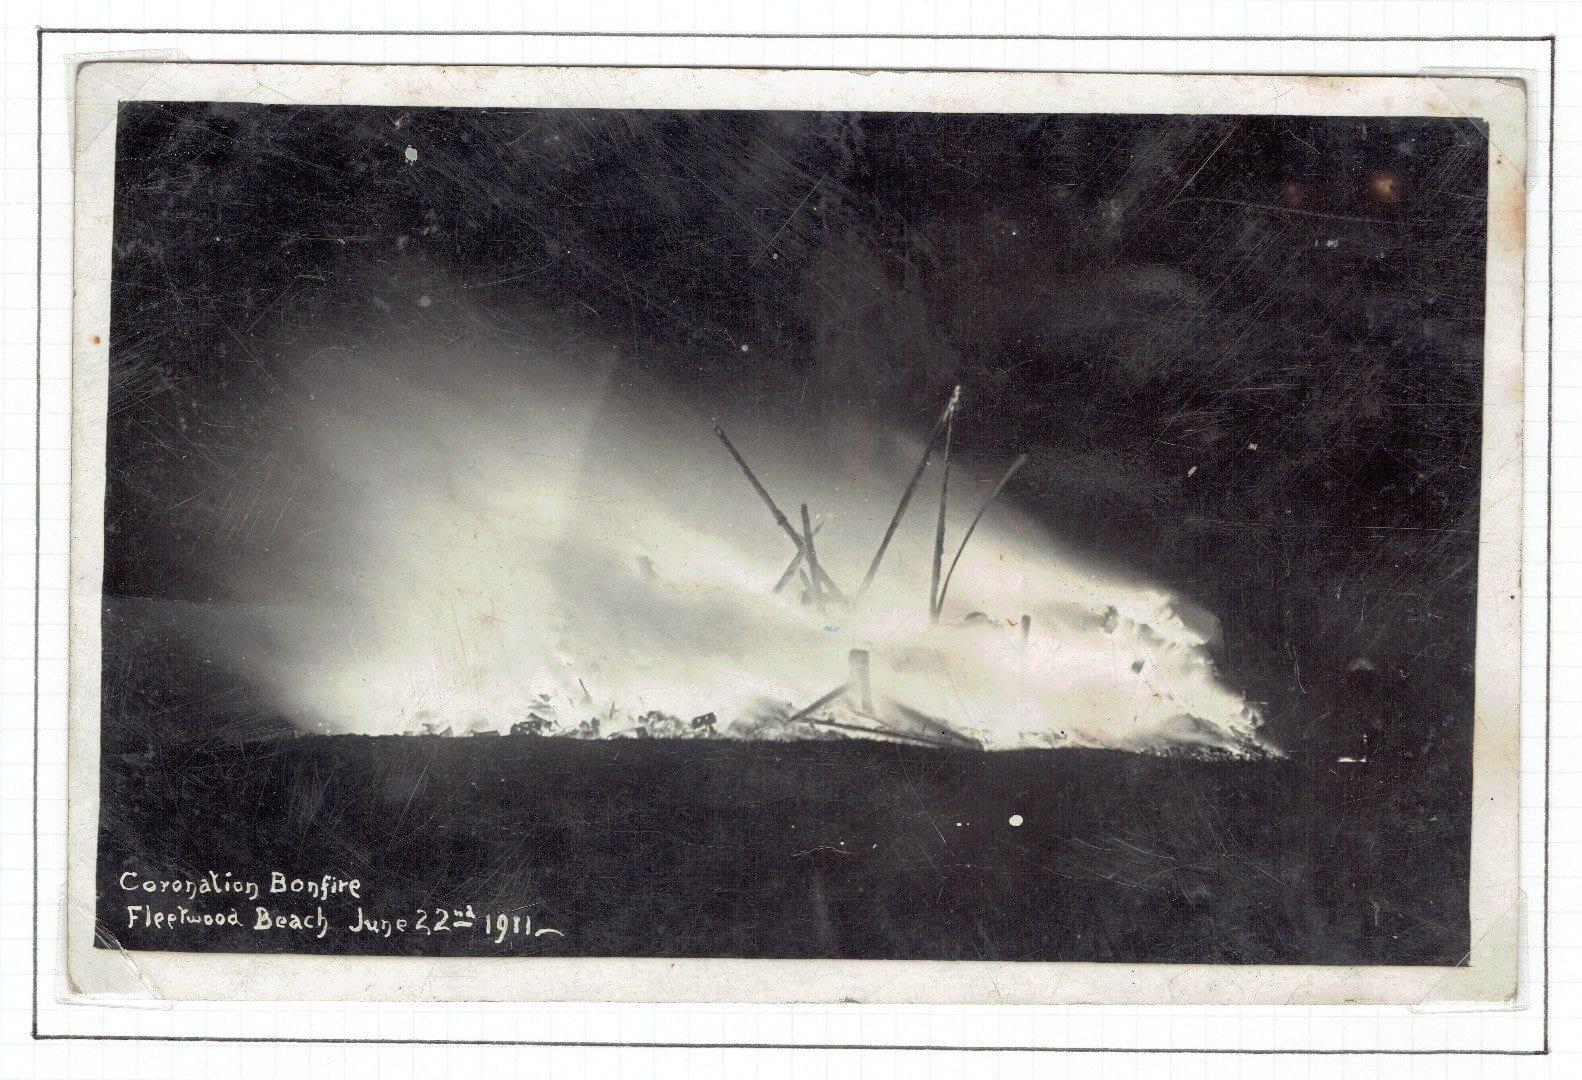 Fleetwood Bonfire of 1911, from Mike Ellis